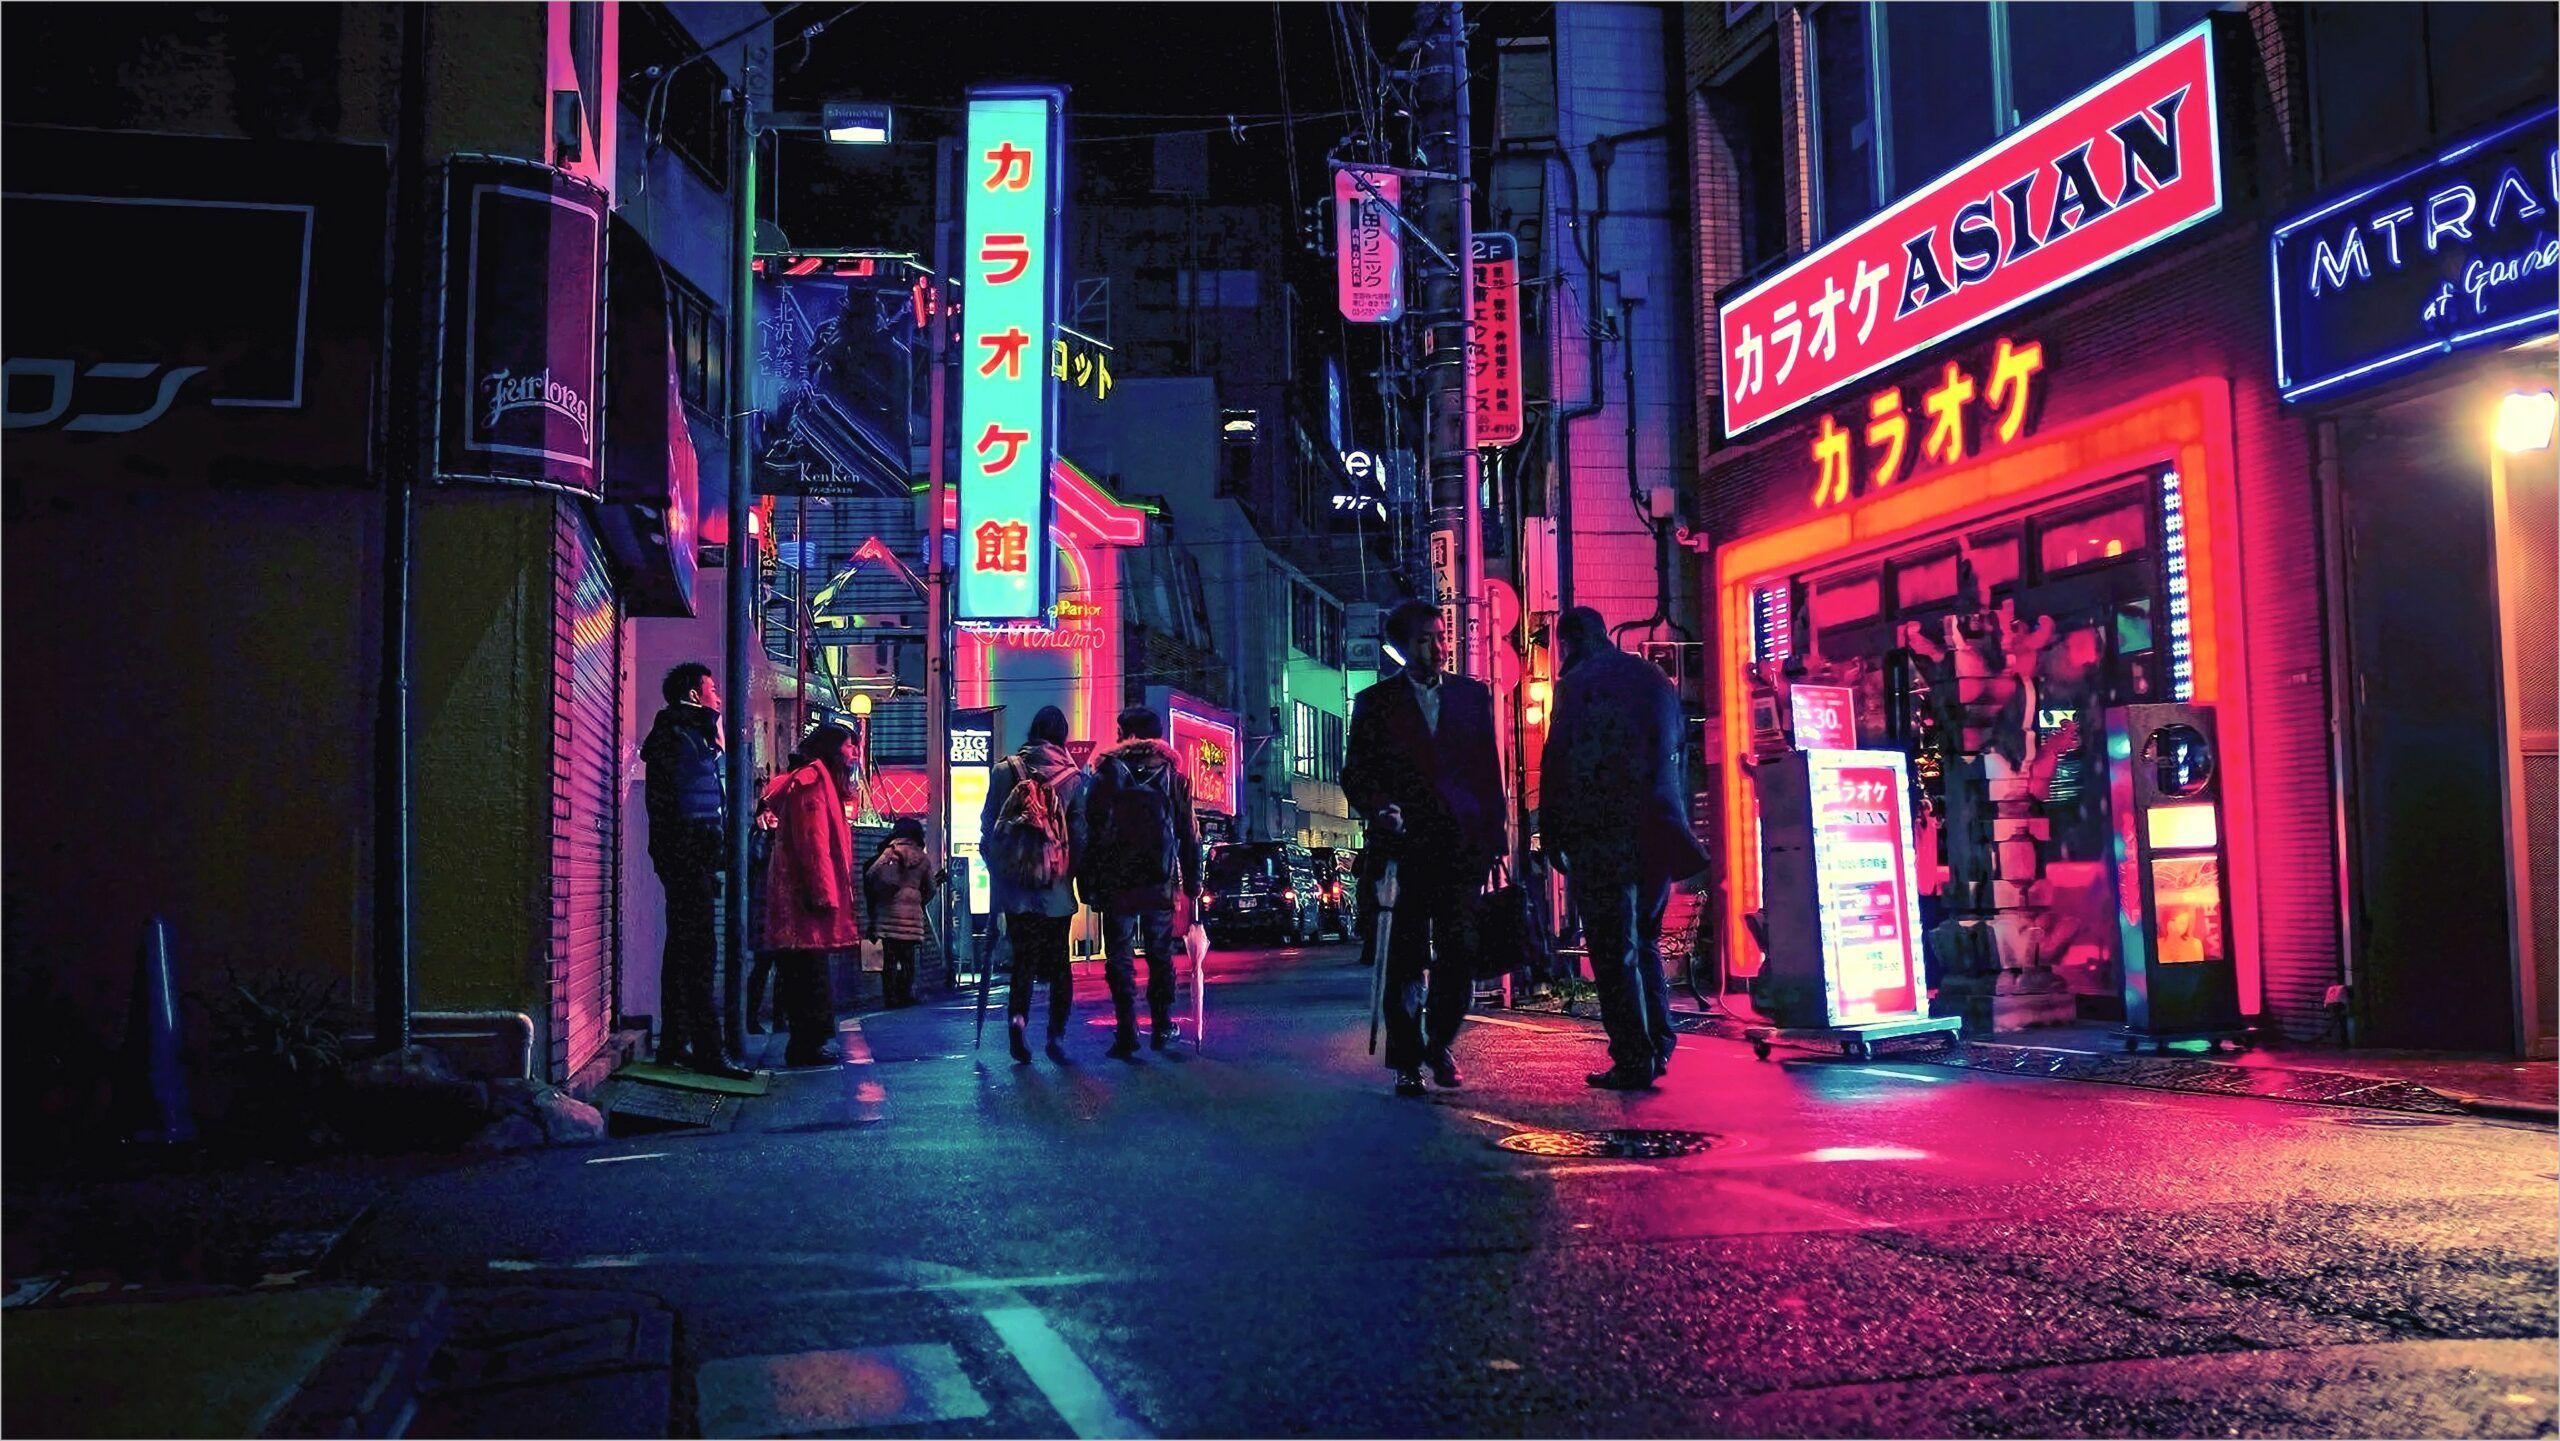 Japan Street Wallpaper Blue And Red 4k Japan Street Japanese Wallpaper Iphone Aesthetic Japan